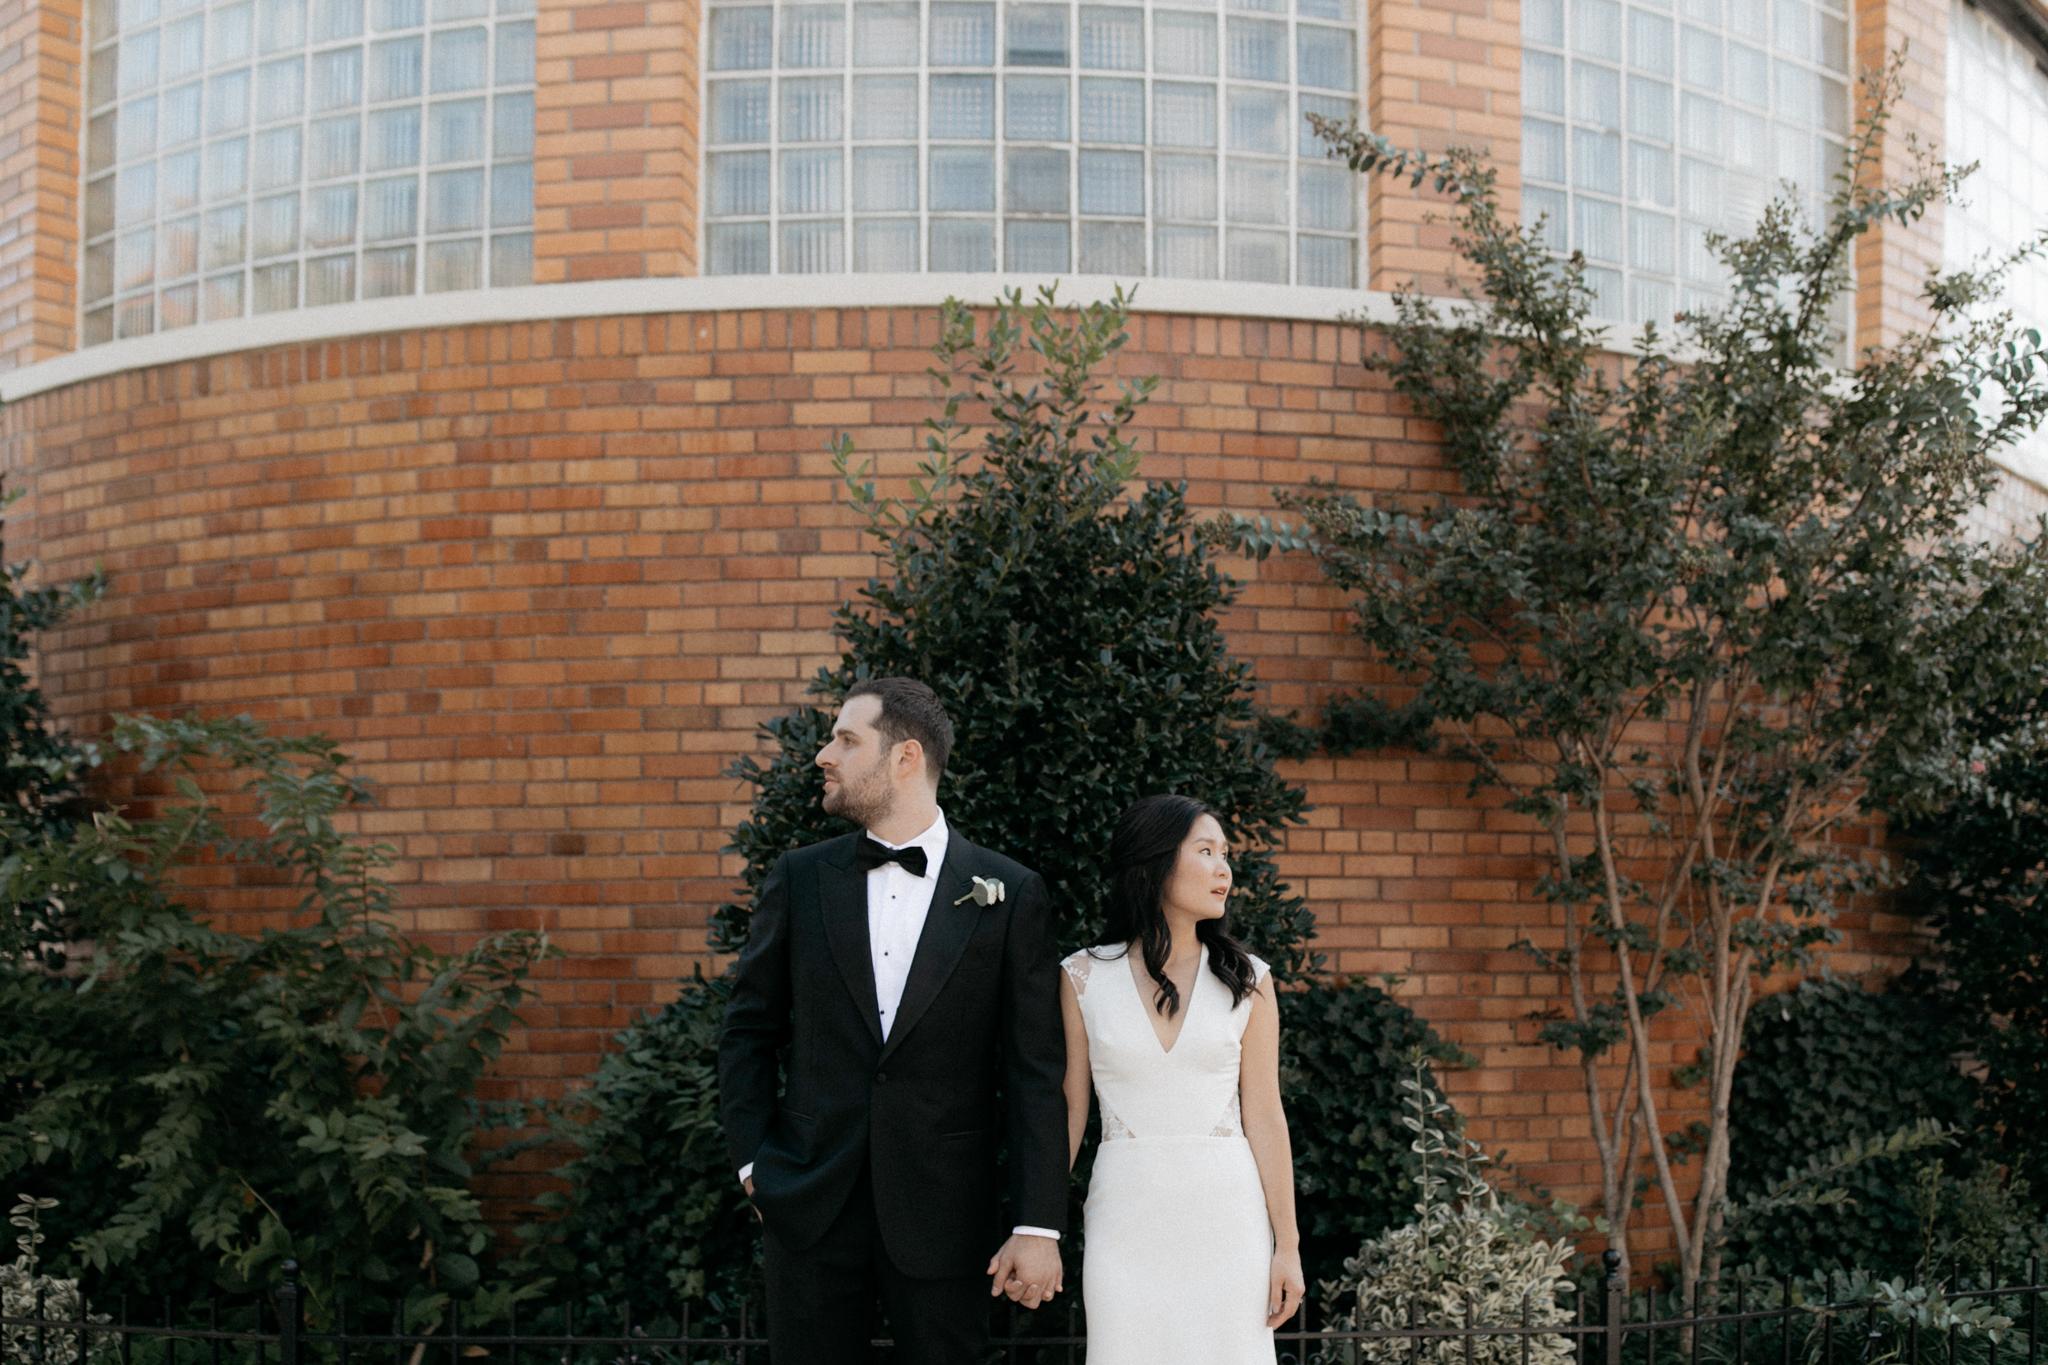 Brooklyn rooftop wedding at box house hotel